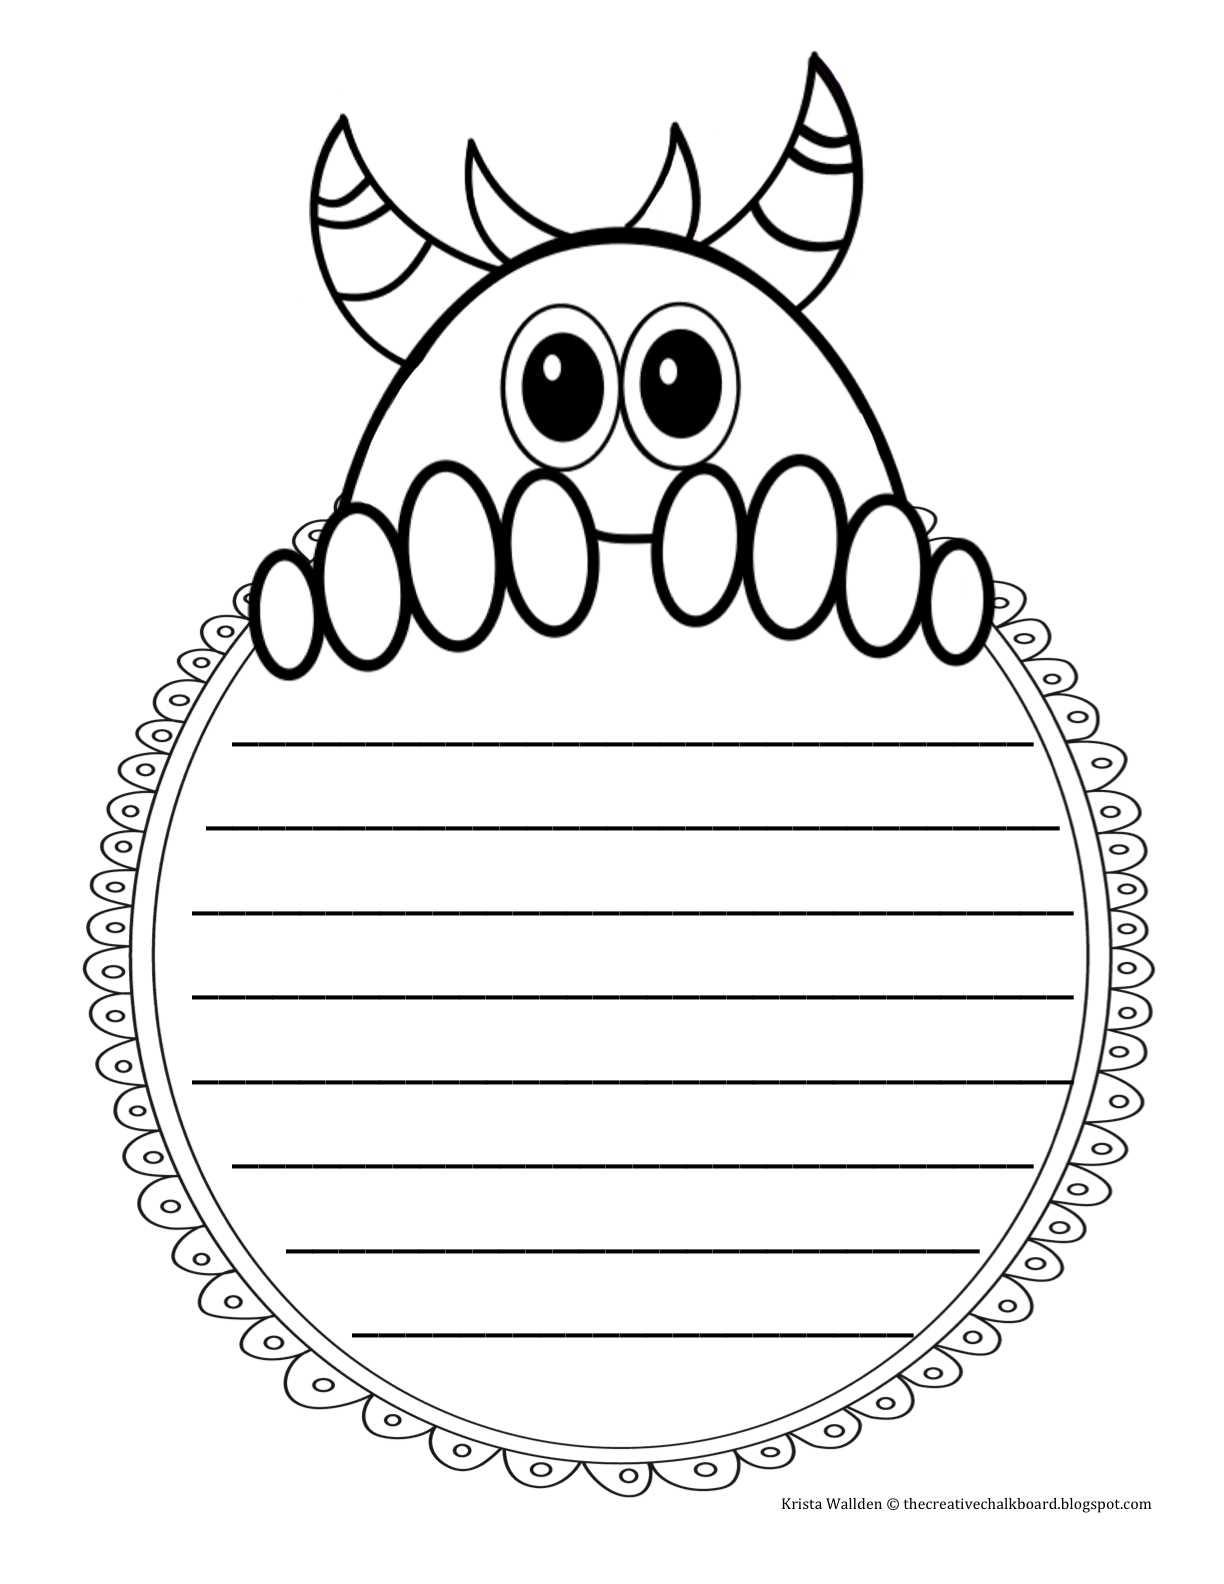 The Creative Chalkboard Day 2 Freebie Monster Writing